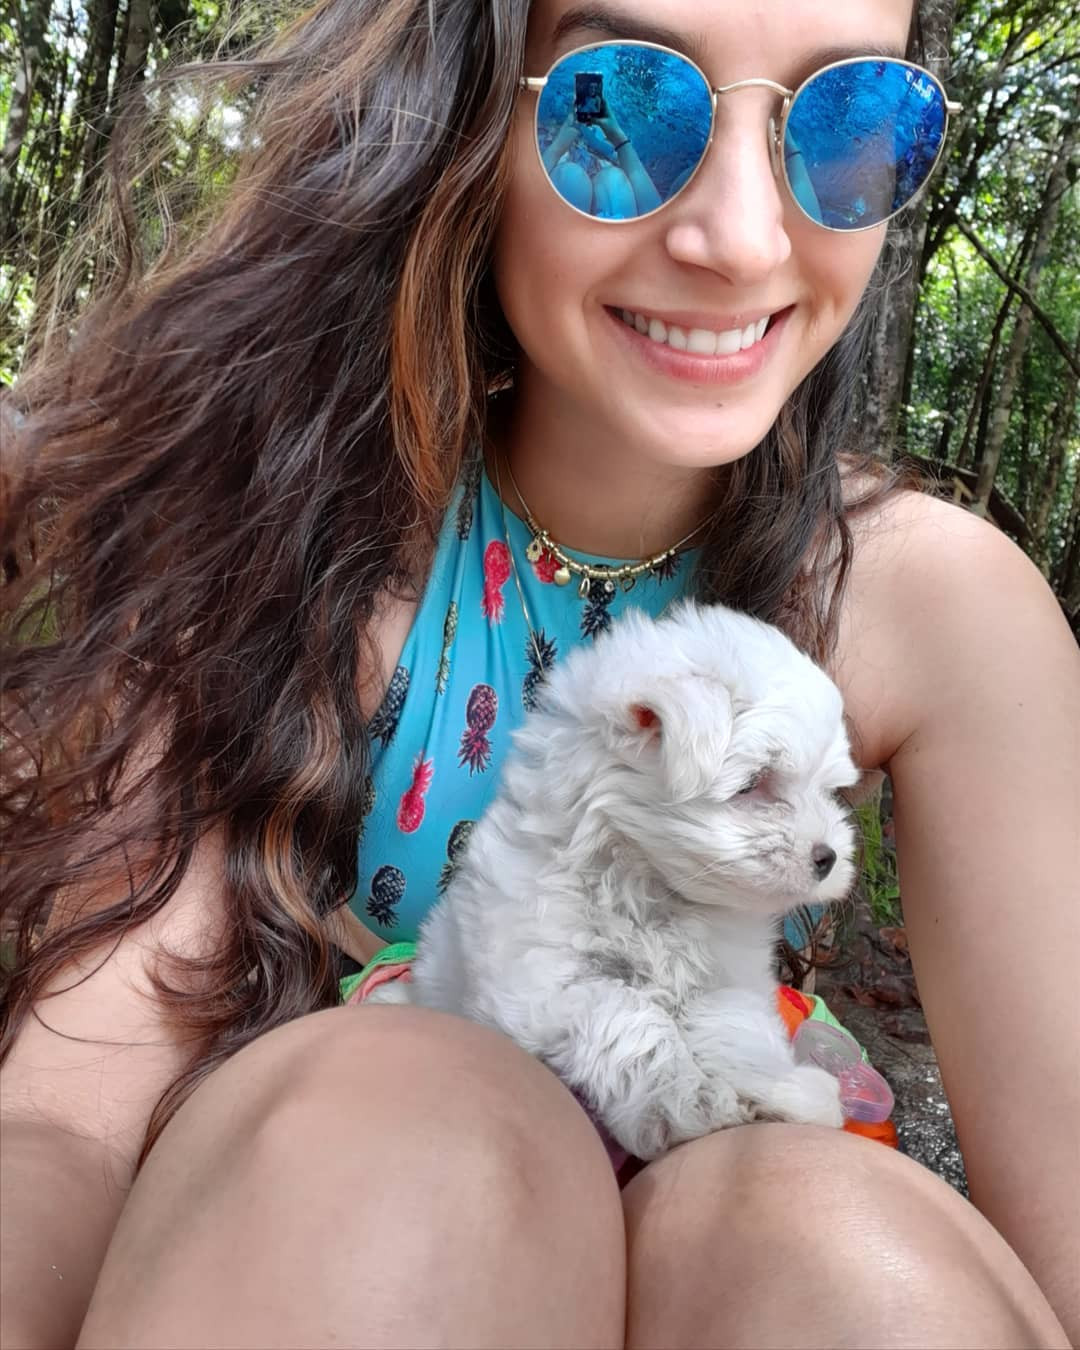 isabella garcia, top 8 de miss brasil mundo 2018/top 20 de miss brasil mundo 2019. - Página 3 Bjeurv10